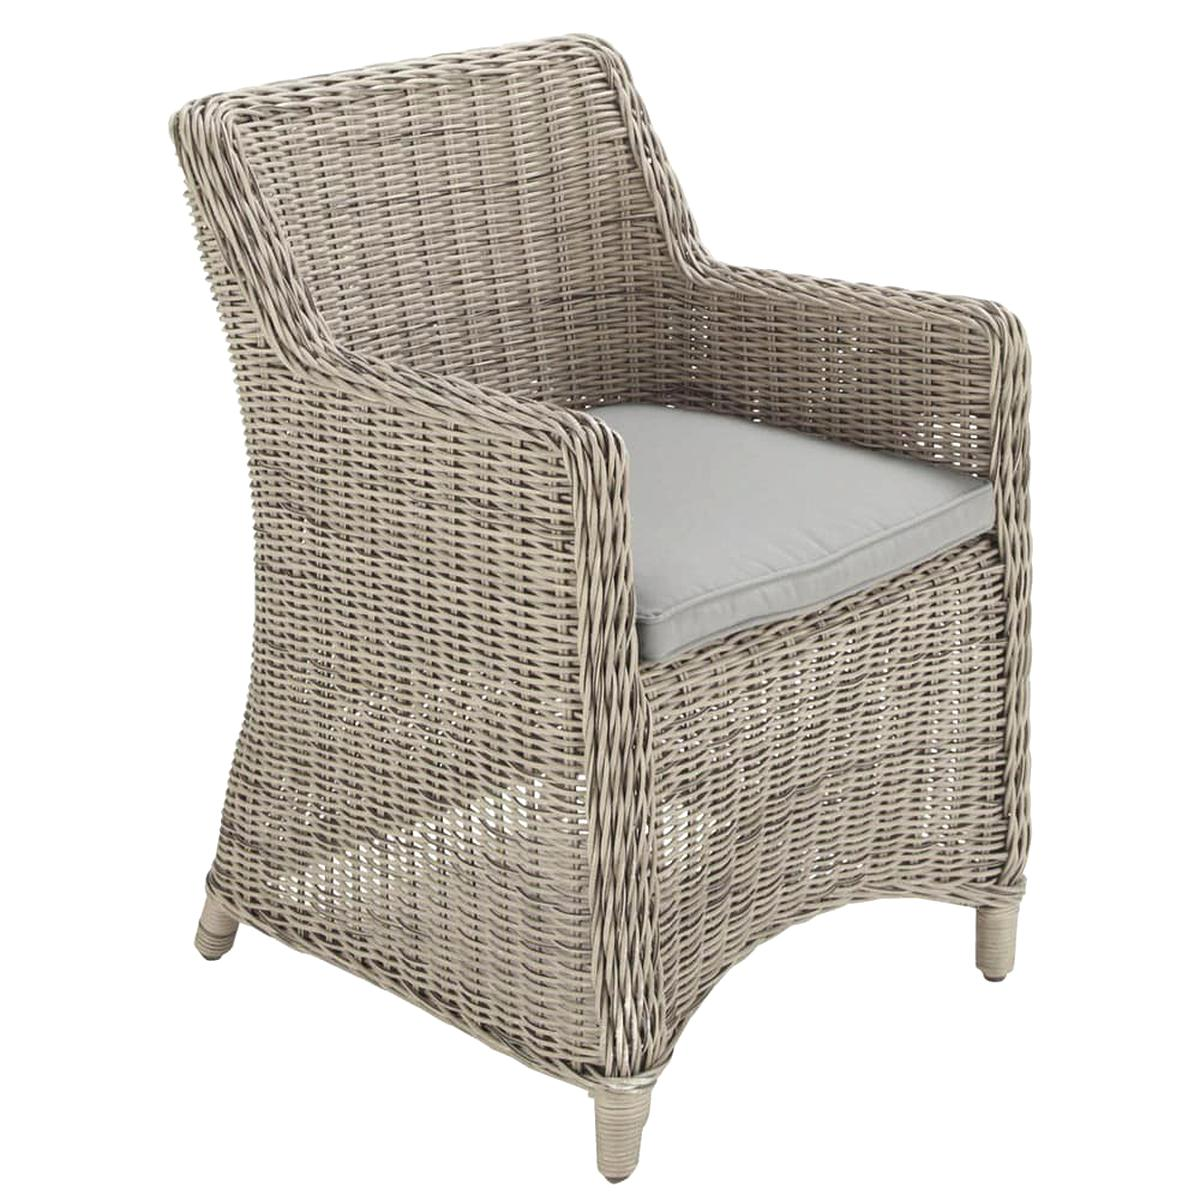 fauteuil jardin resine tressee d occasion